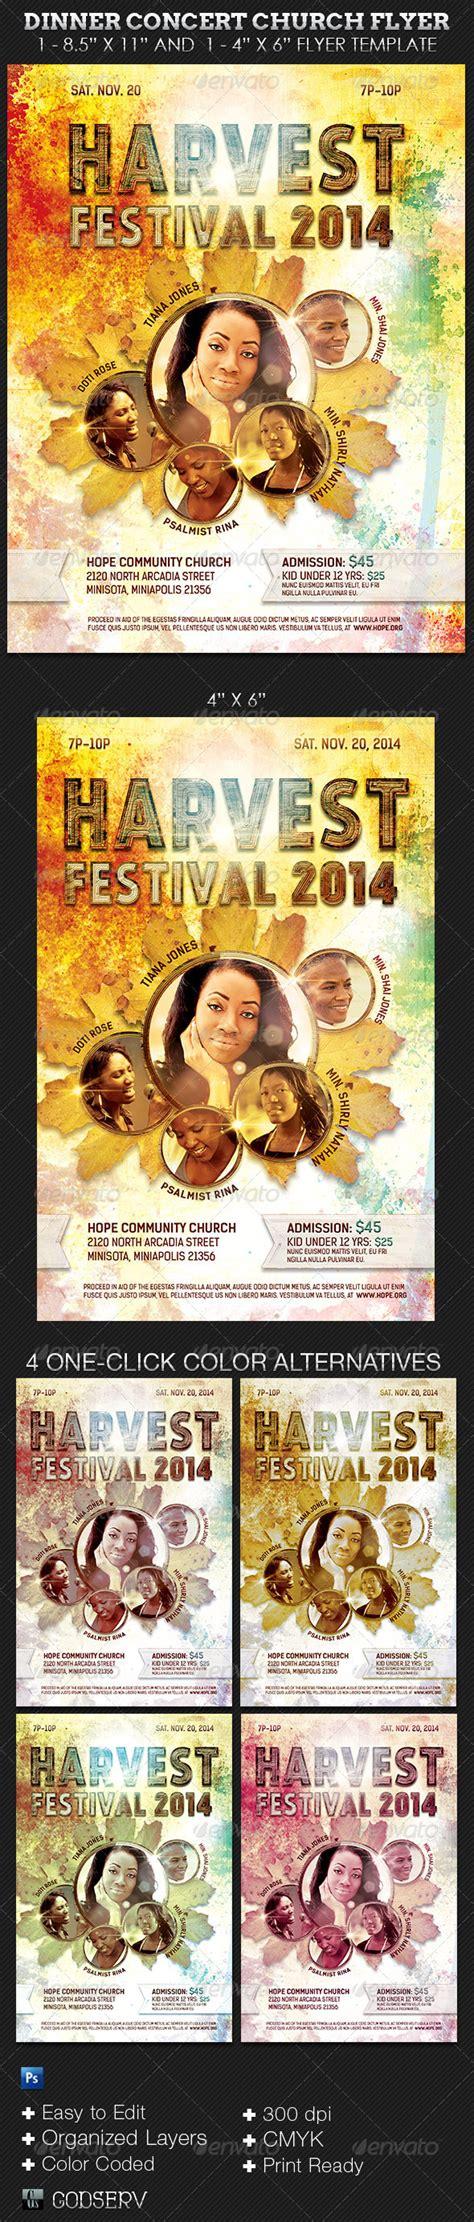 Harvest Festival Concert Flyer Template By Godserv On Deviantart Harvest Festival Flyer Free Template